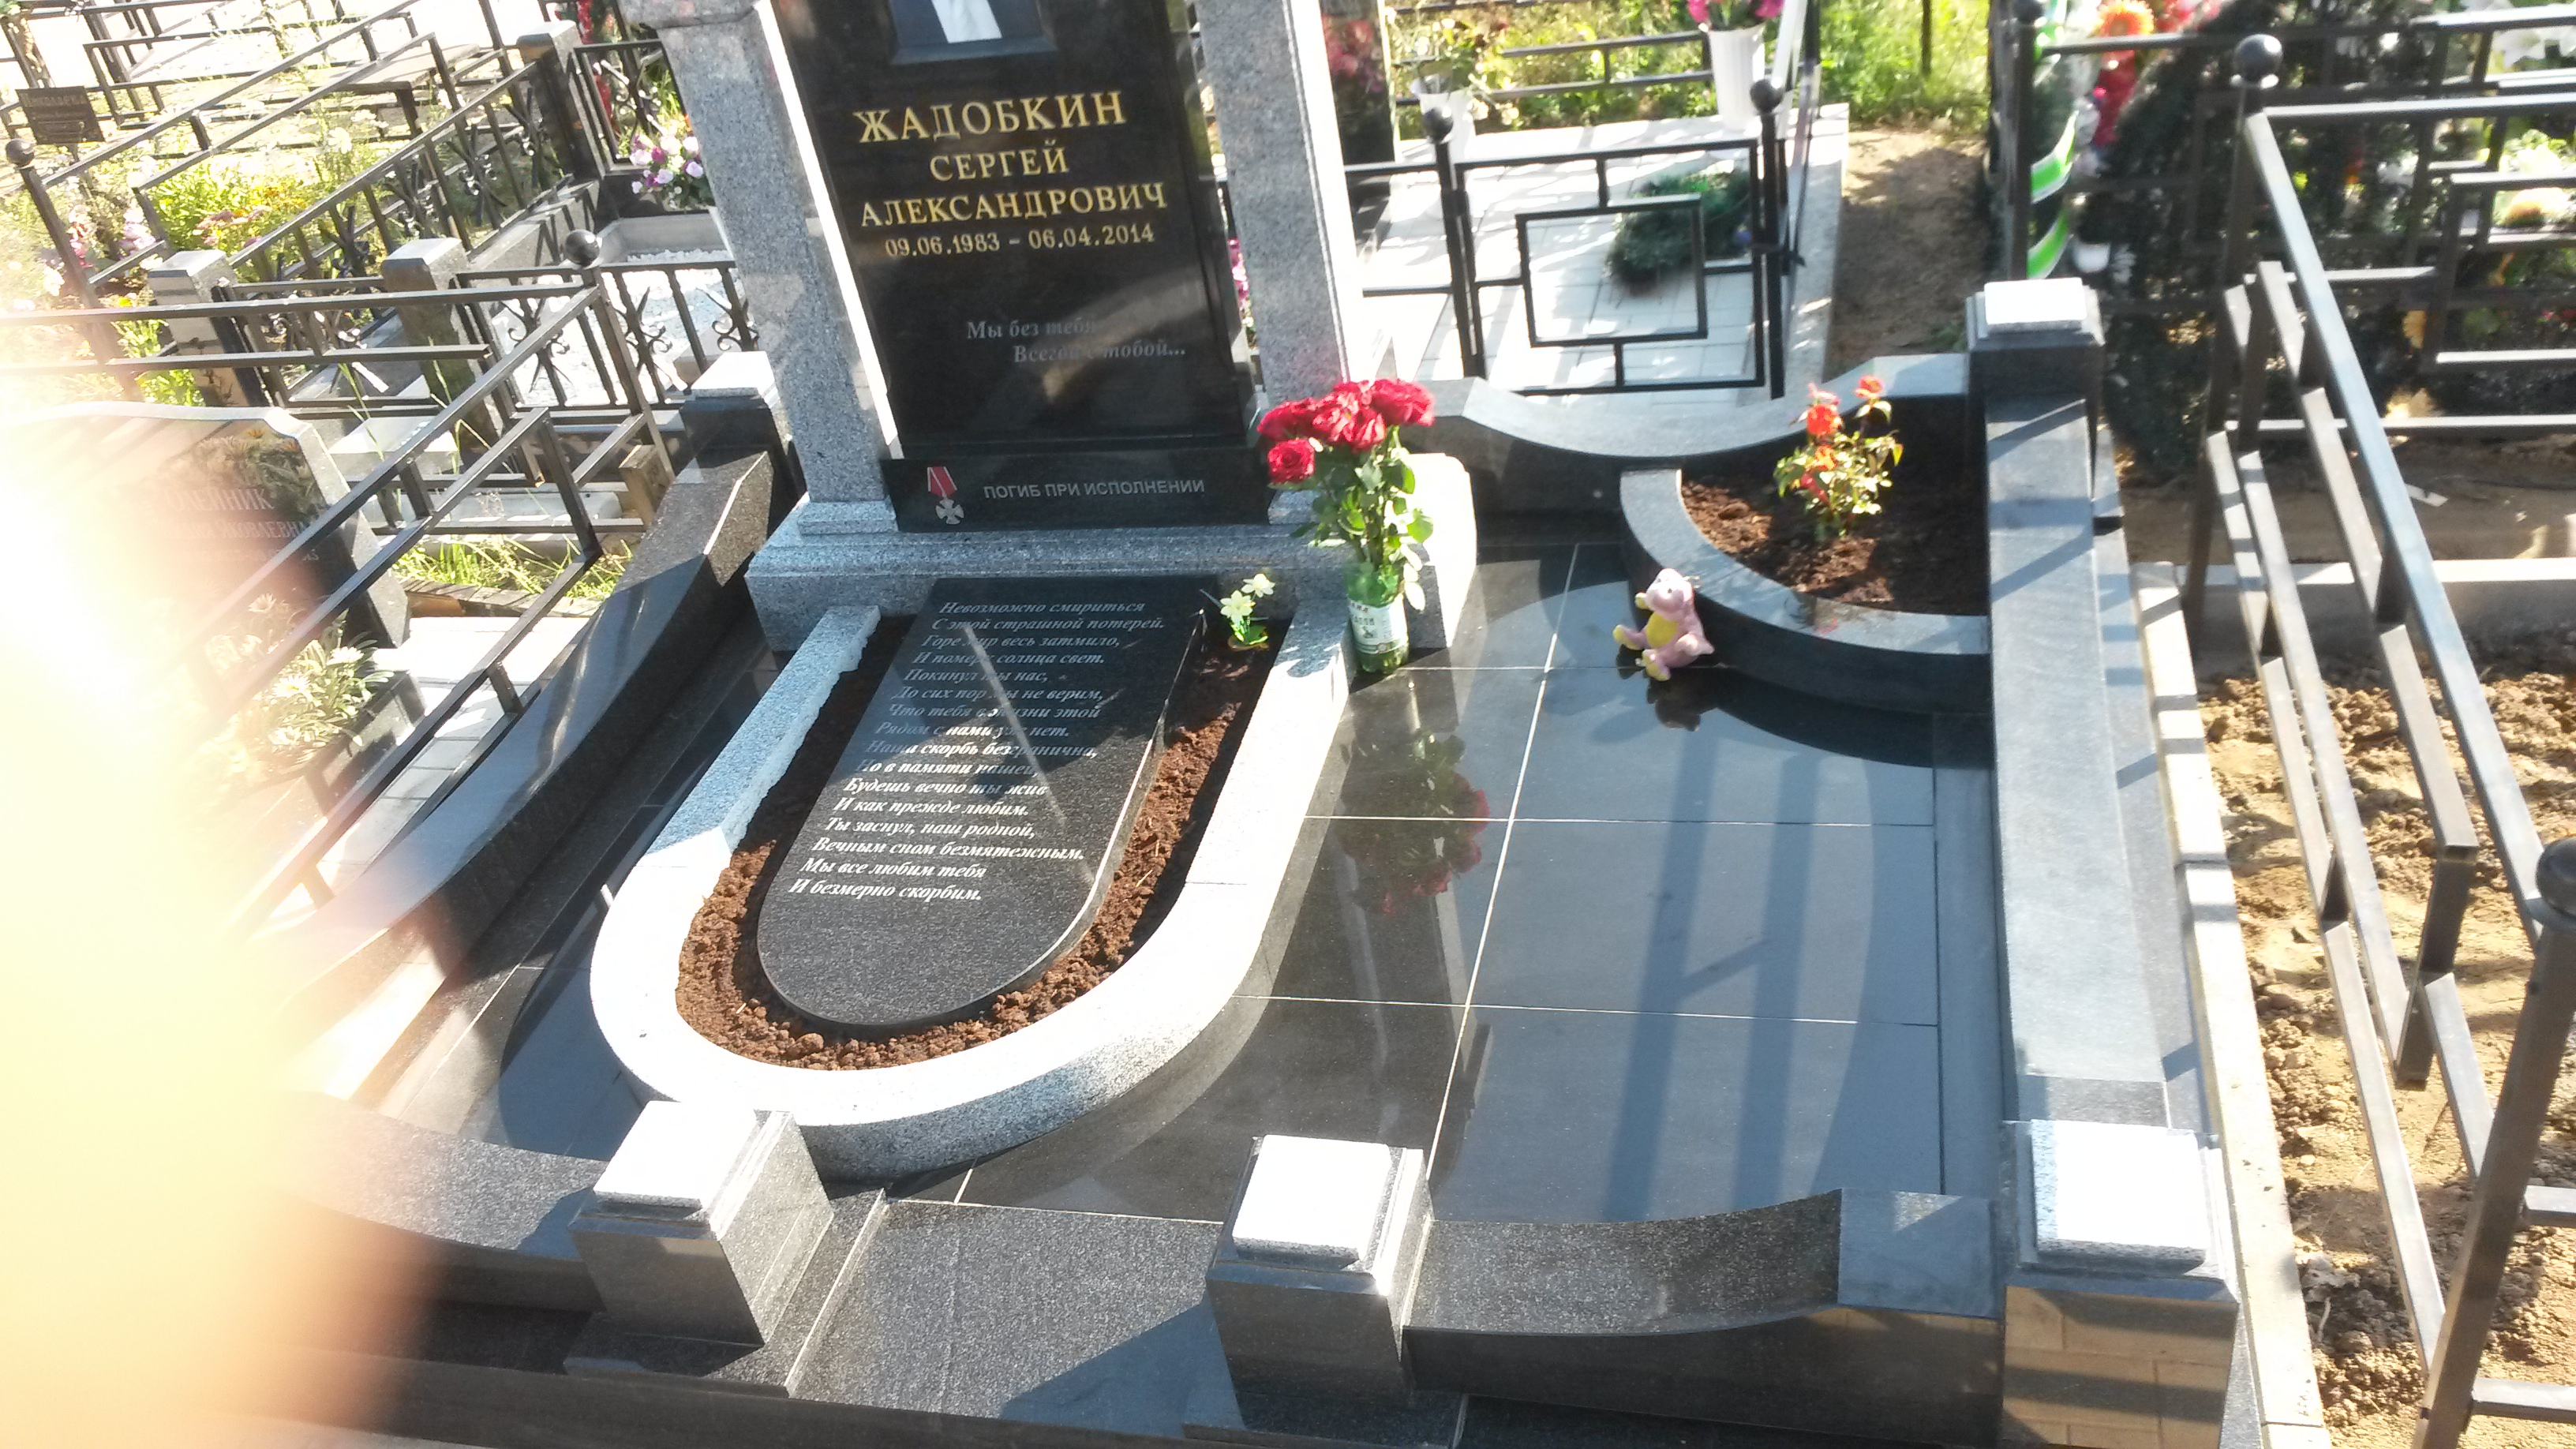 Законченная работа на Пенягинском кладбище, размер 2.7х2 метра